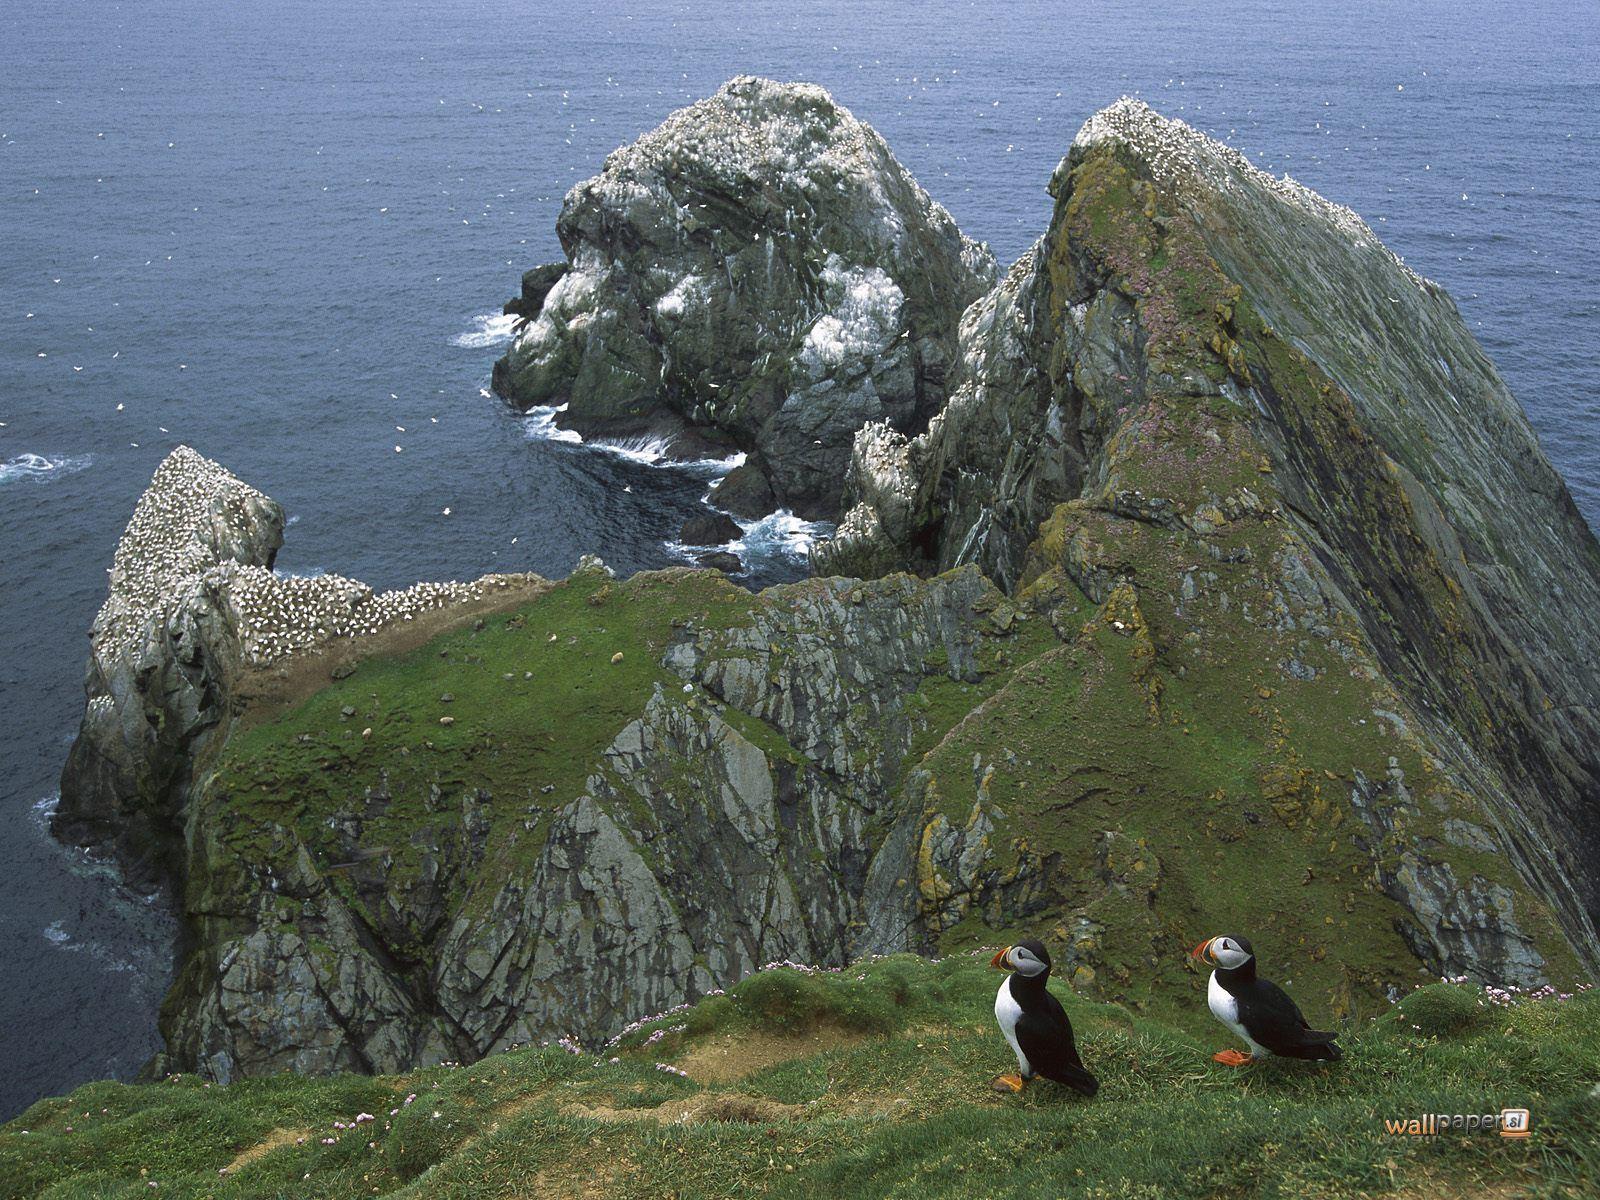 http://2.bp.blogspot.com/-CUDdiIzTe4c/ThZ49815osI/AAAAAAAAAlY/-vZOXsuc4i0/s1600/Atlantic-Puffin-Hermaness-Unst-Island-Shetland-Islands-United-Kingdom-Wallpaper.jpg